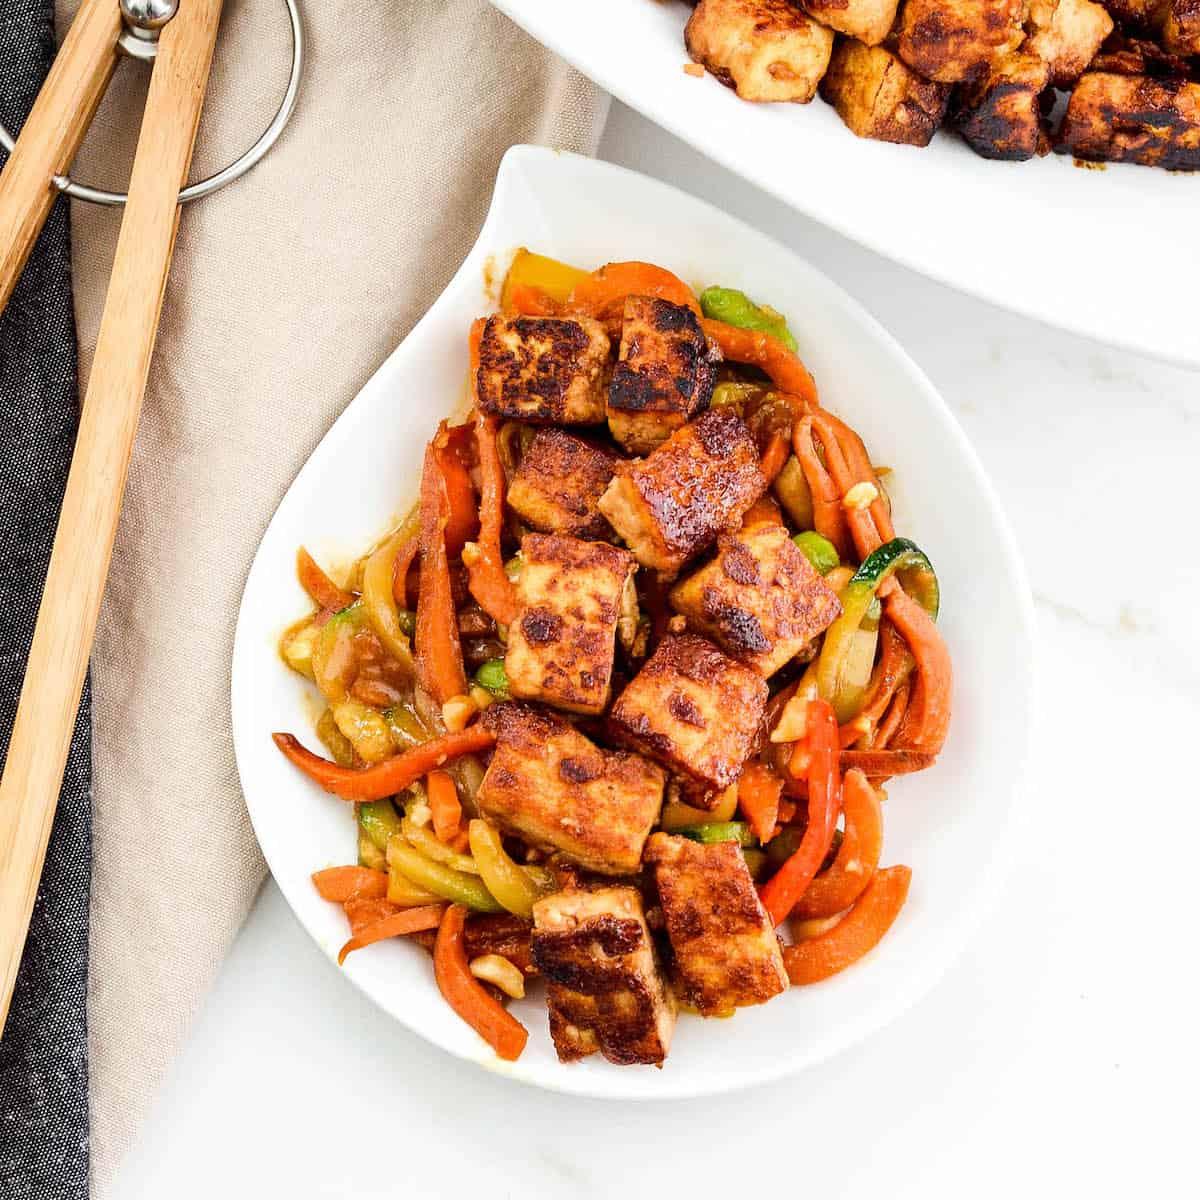 Overhead view of crispy tofu with hoisin sauce recipe on a white plate over stir fried veggies.